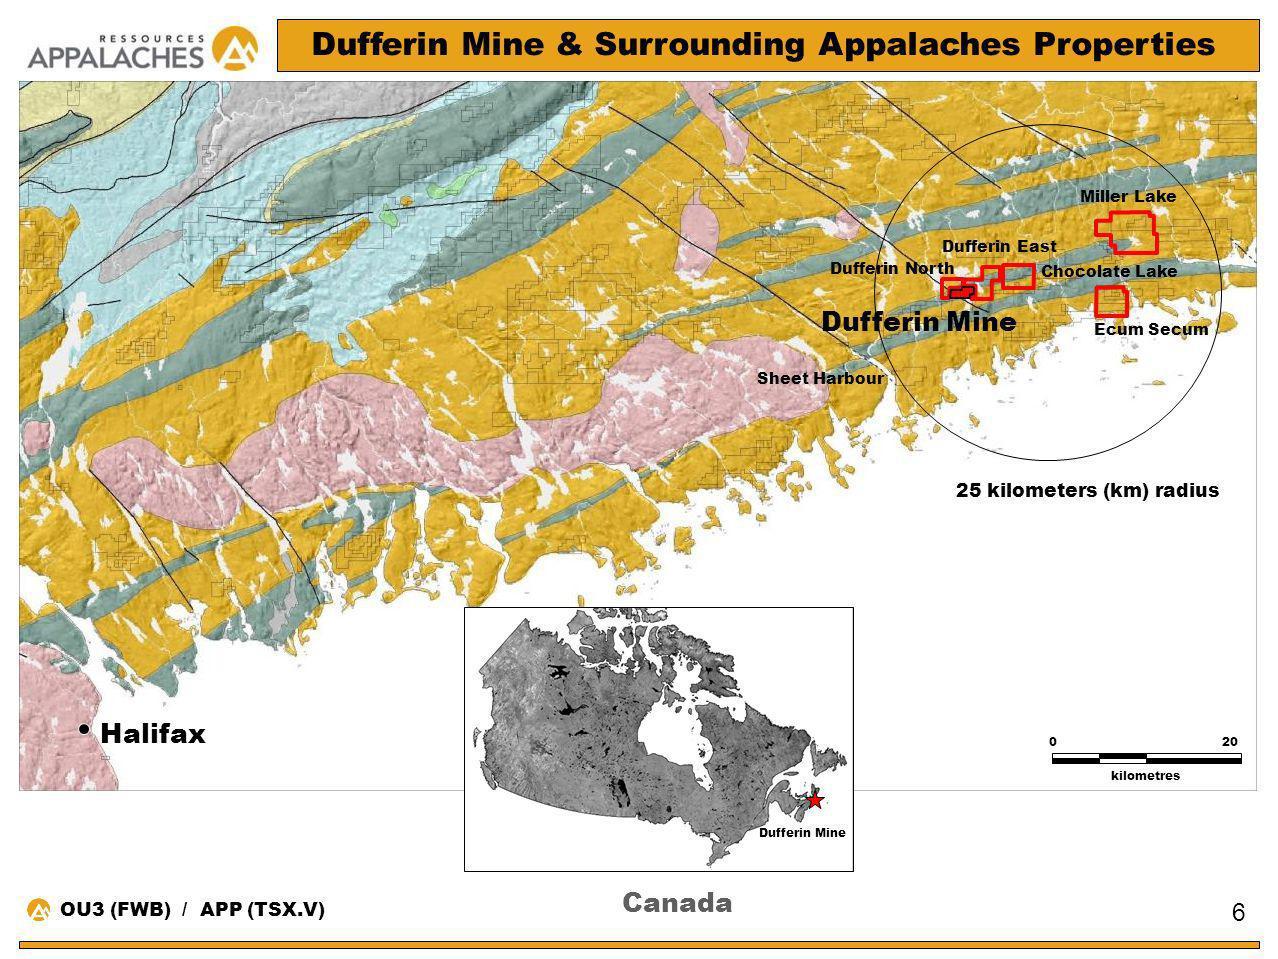 Canada Halifax Sheet Harbour 020 kilometres Miller Lake Dufferin Mine Dufferin Mine & Surrounding Appalaches Properties Chocolate Lake Ecum Secum 6 25